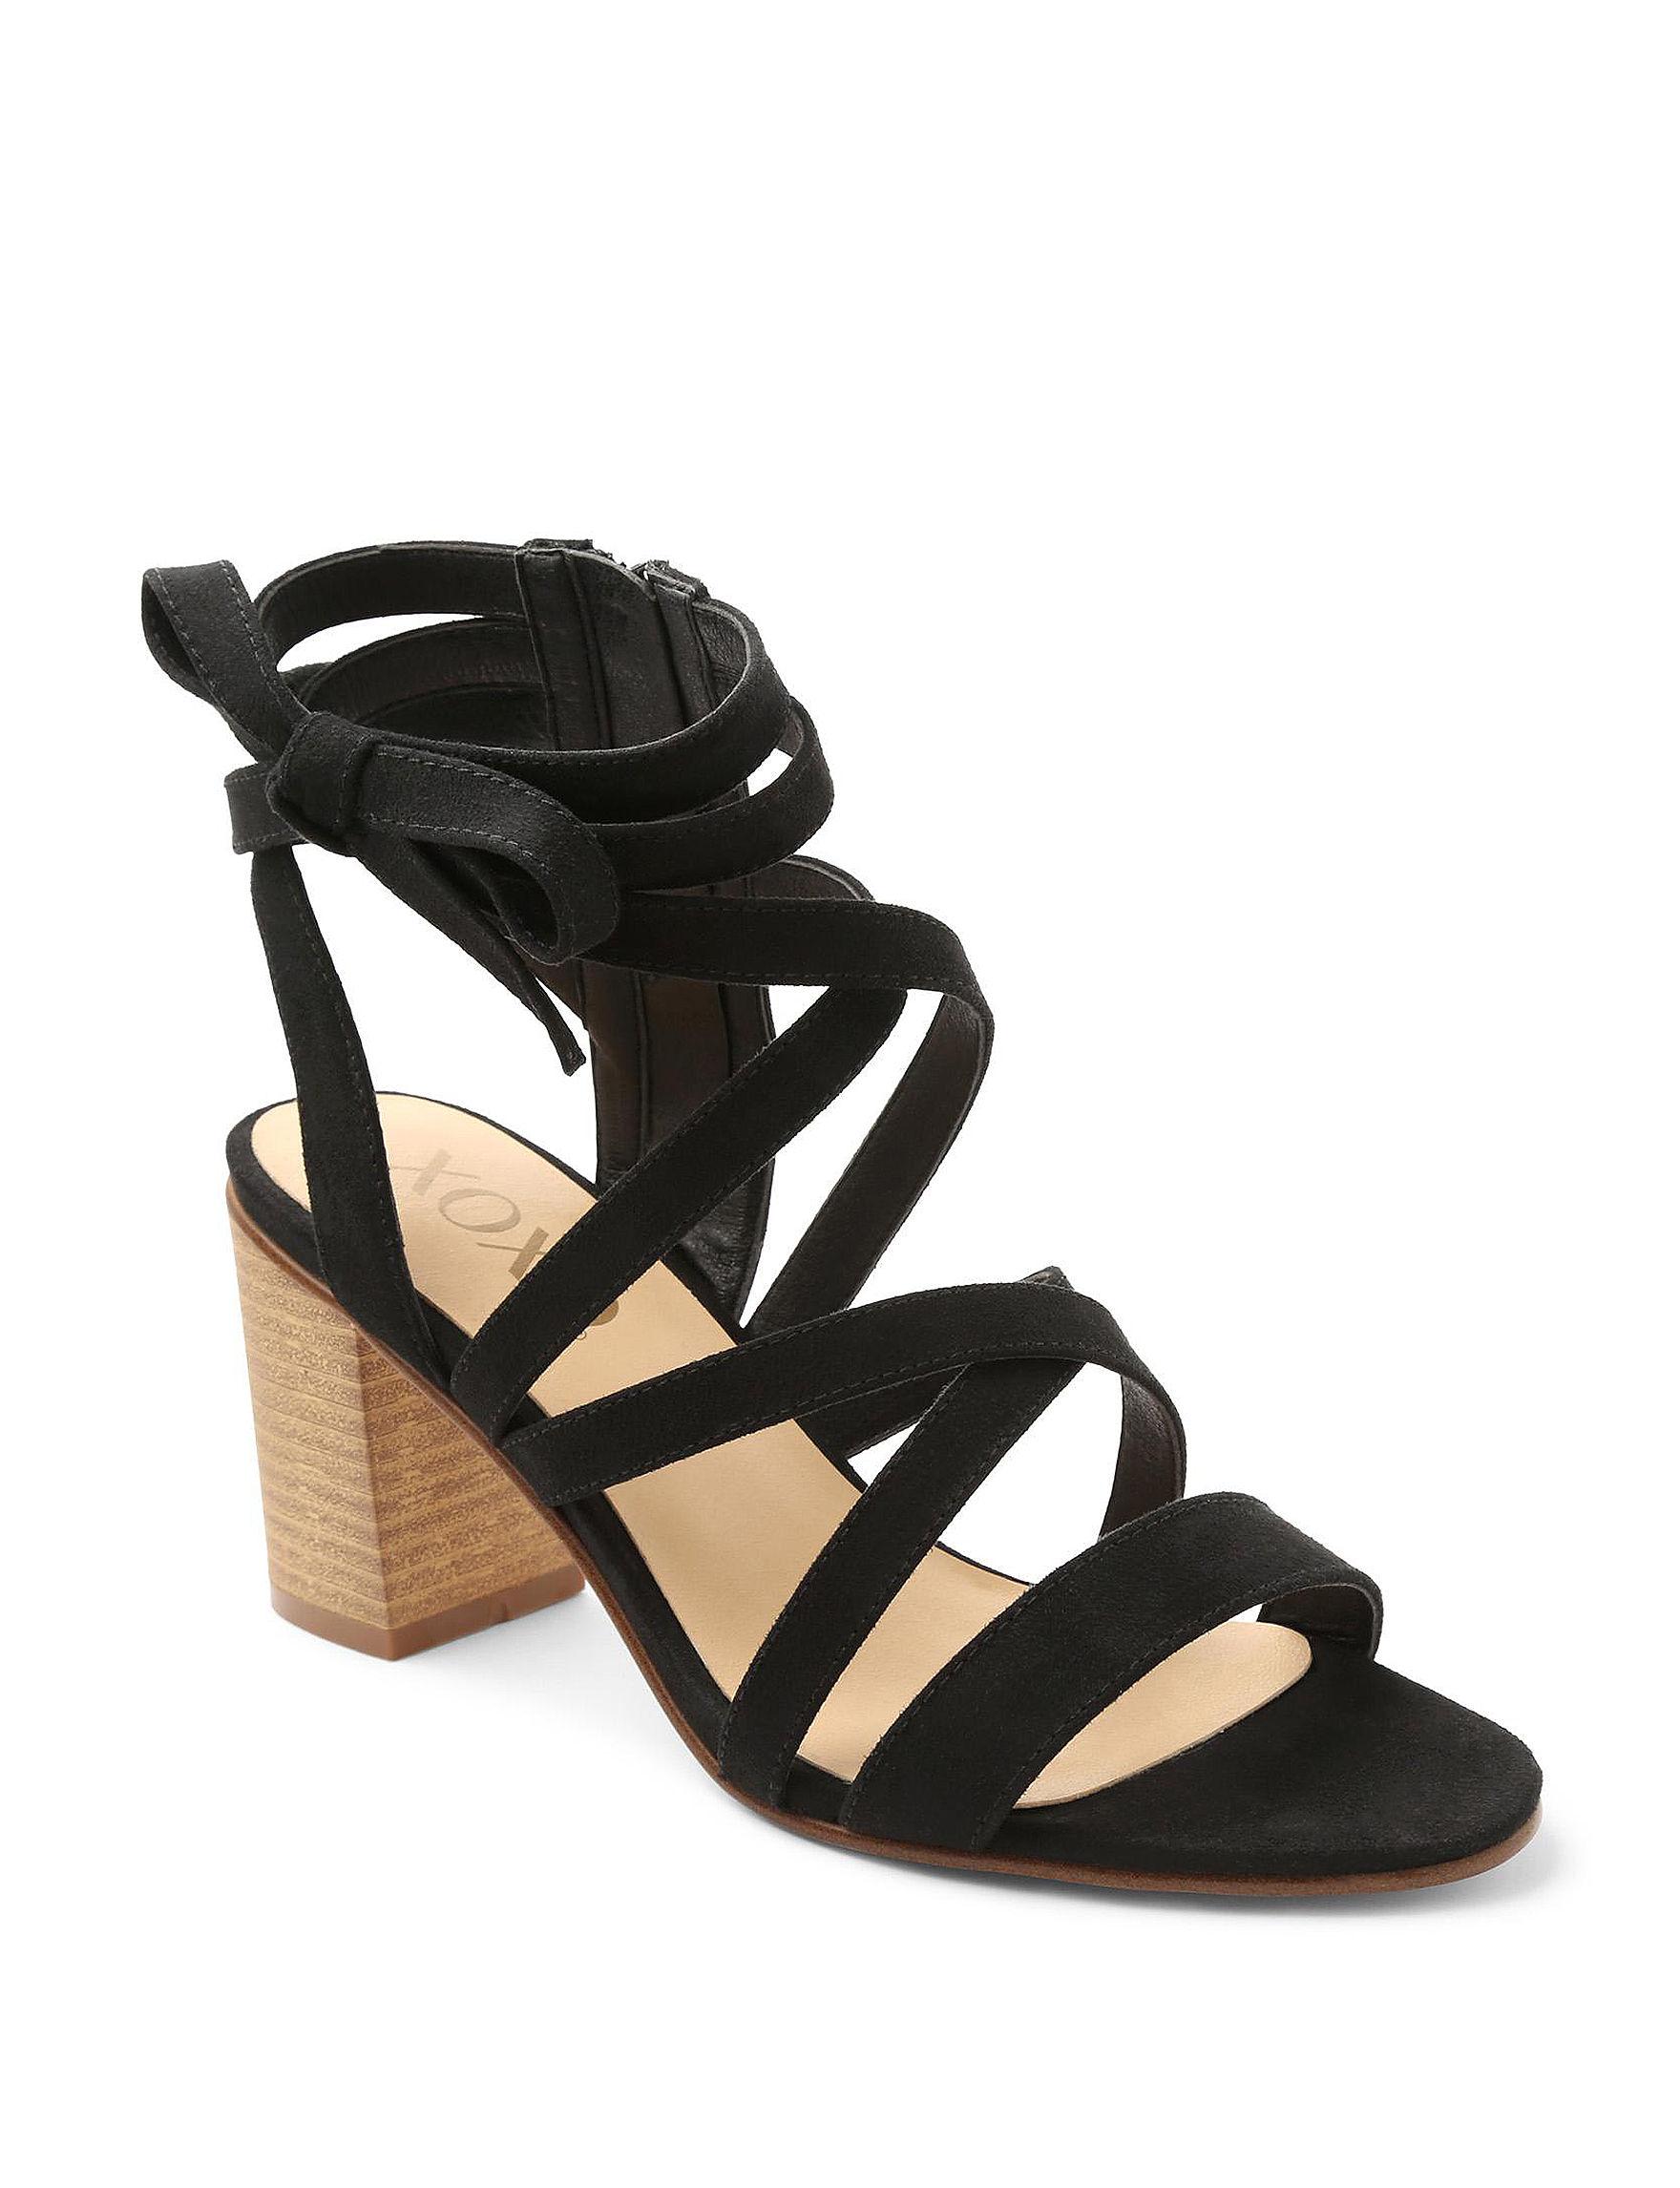 XOXO Black Heeled Sandals